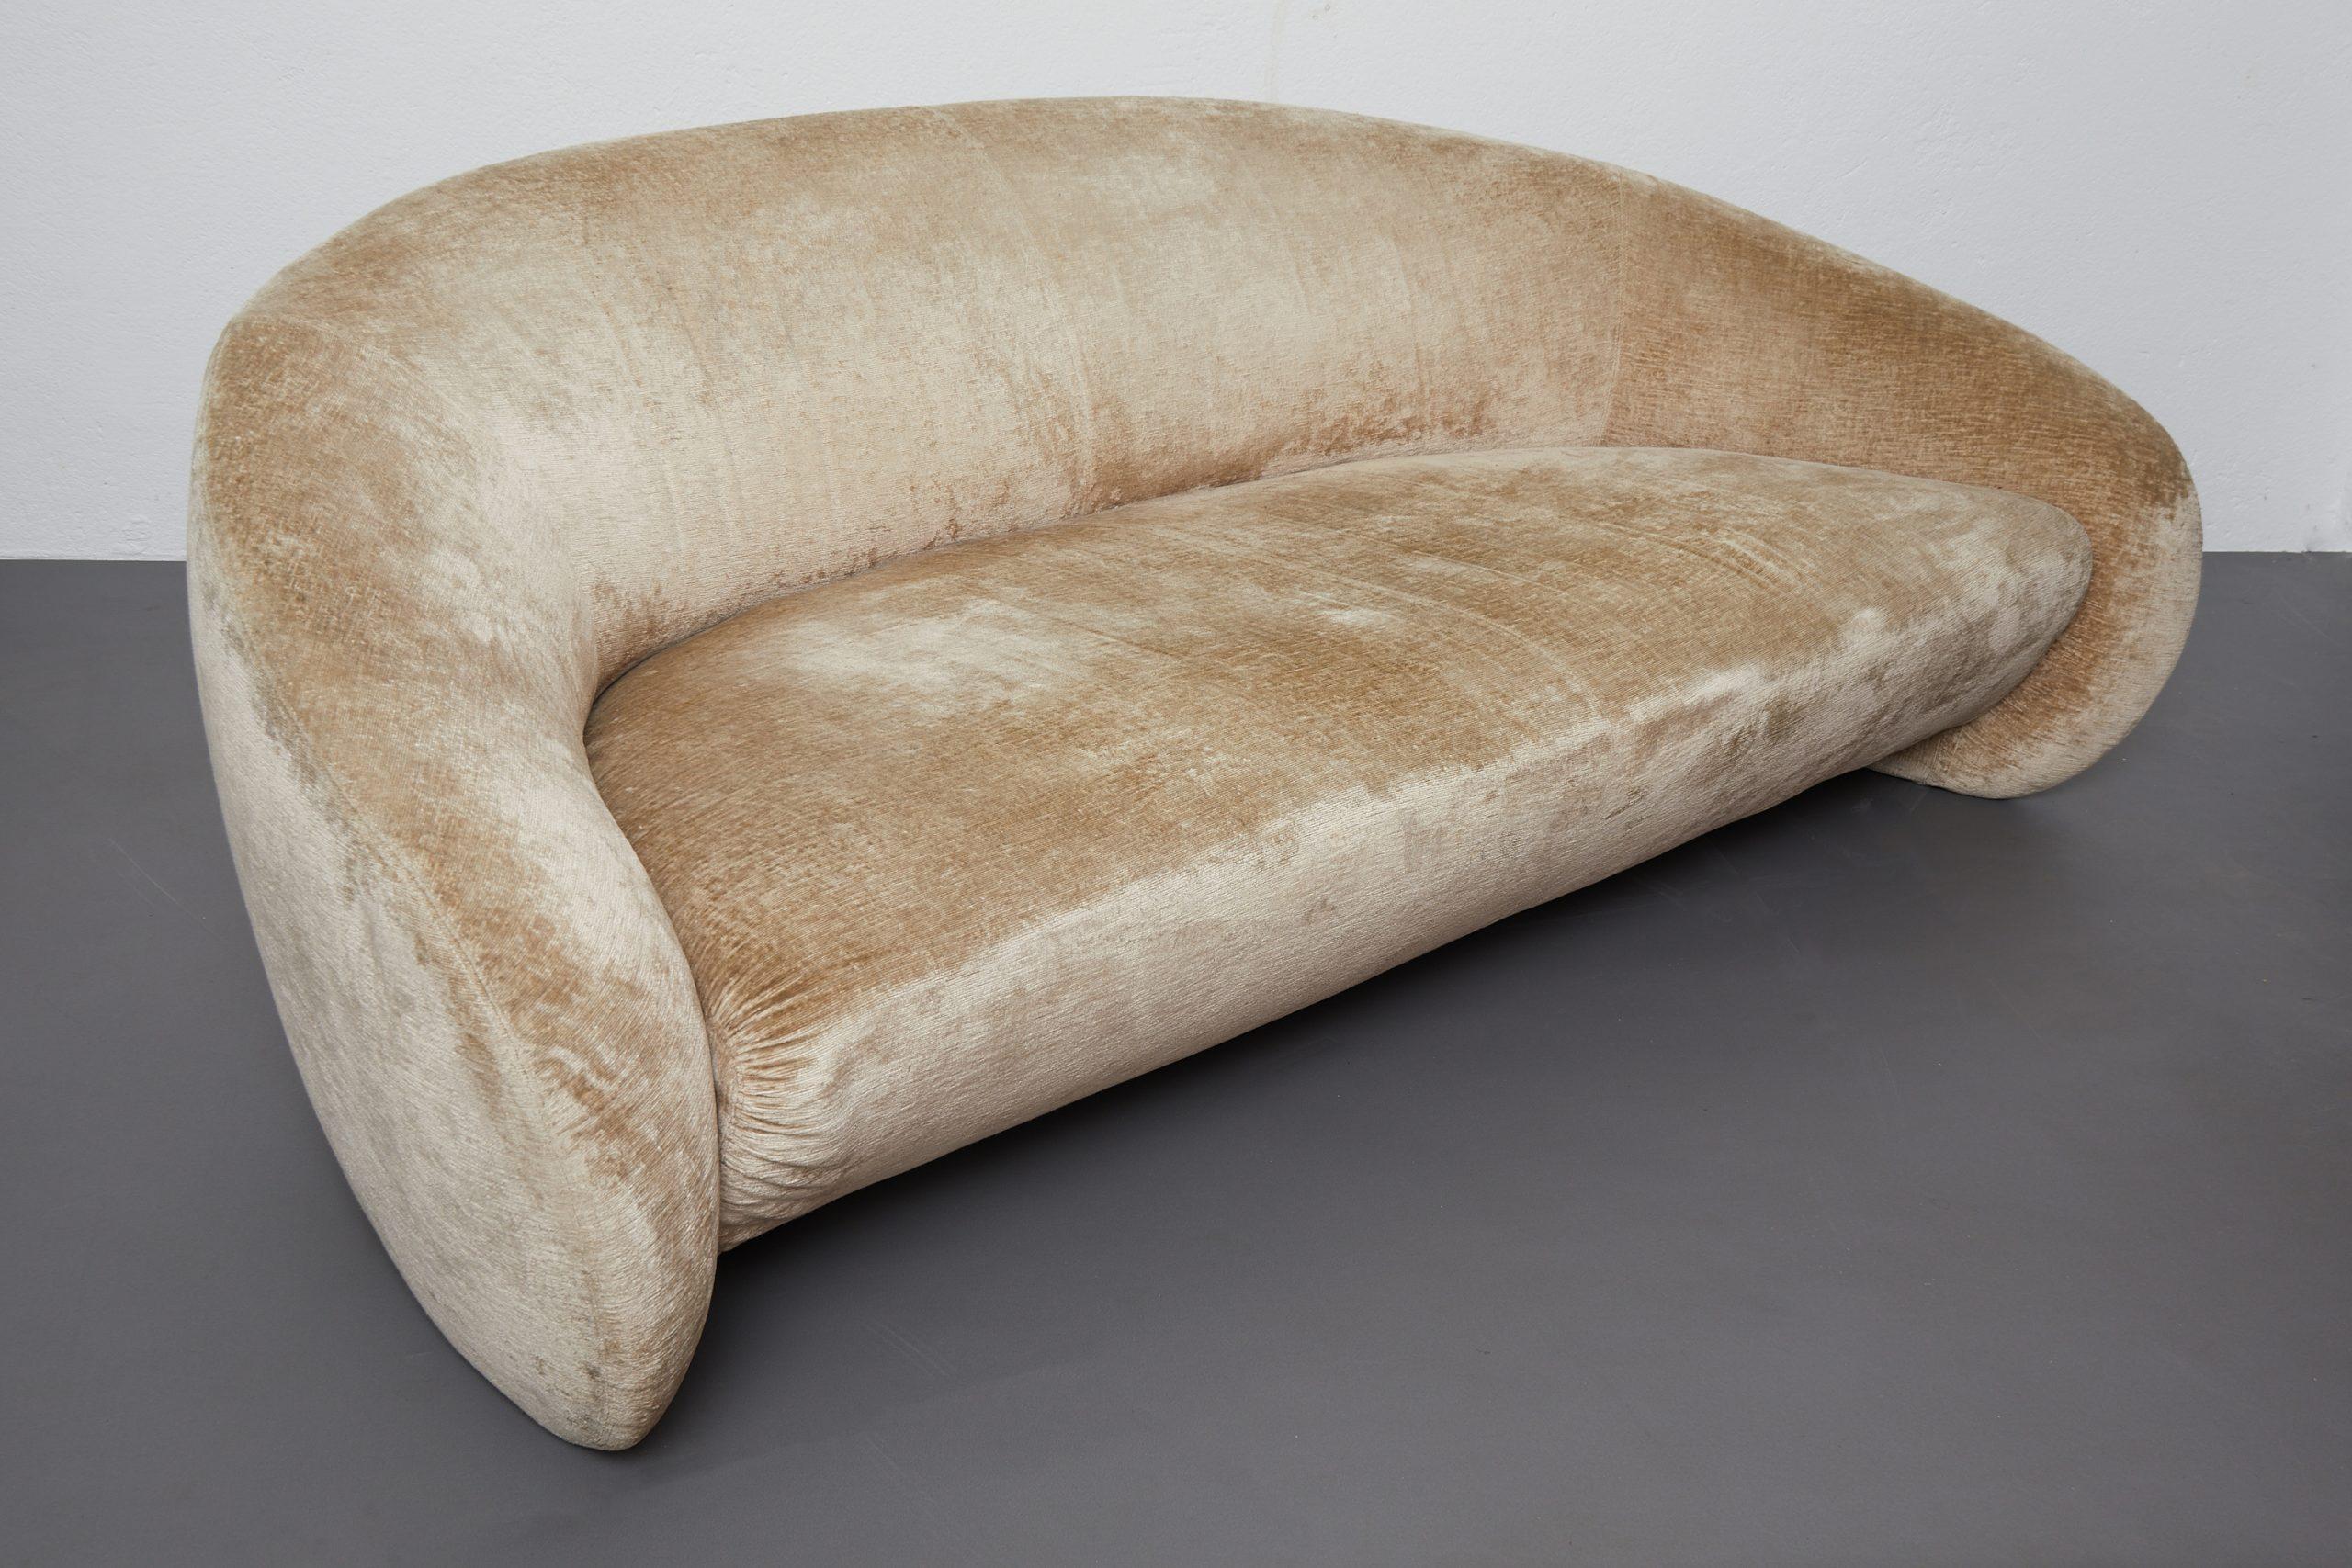 hudson-beige-velvet-curved-sofa-by-roberto-lazzeroni-for-ipe-cavalli-italy-image-02